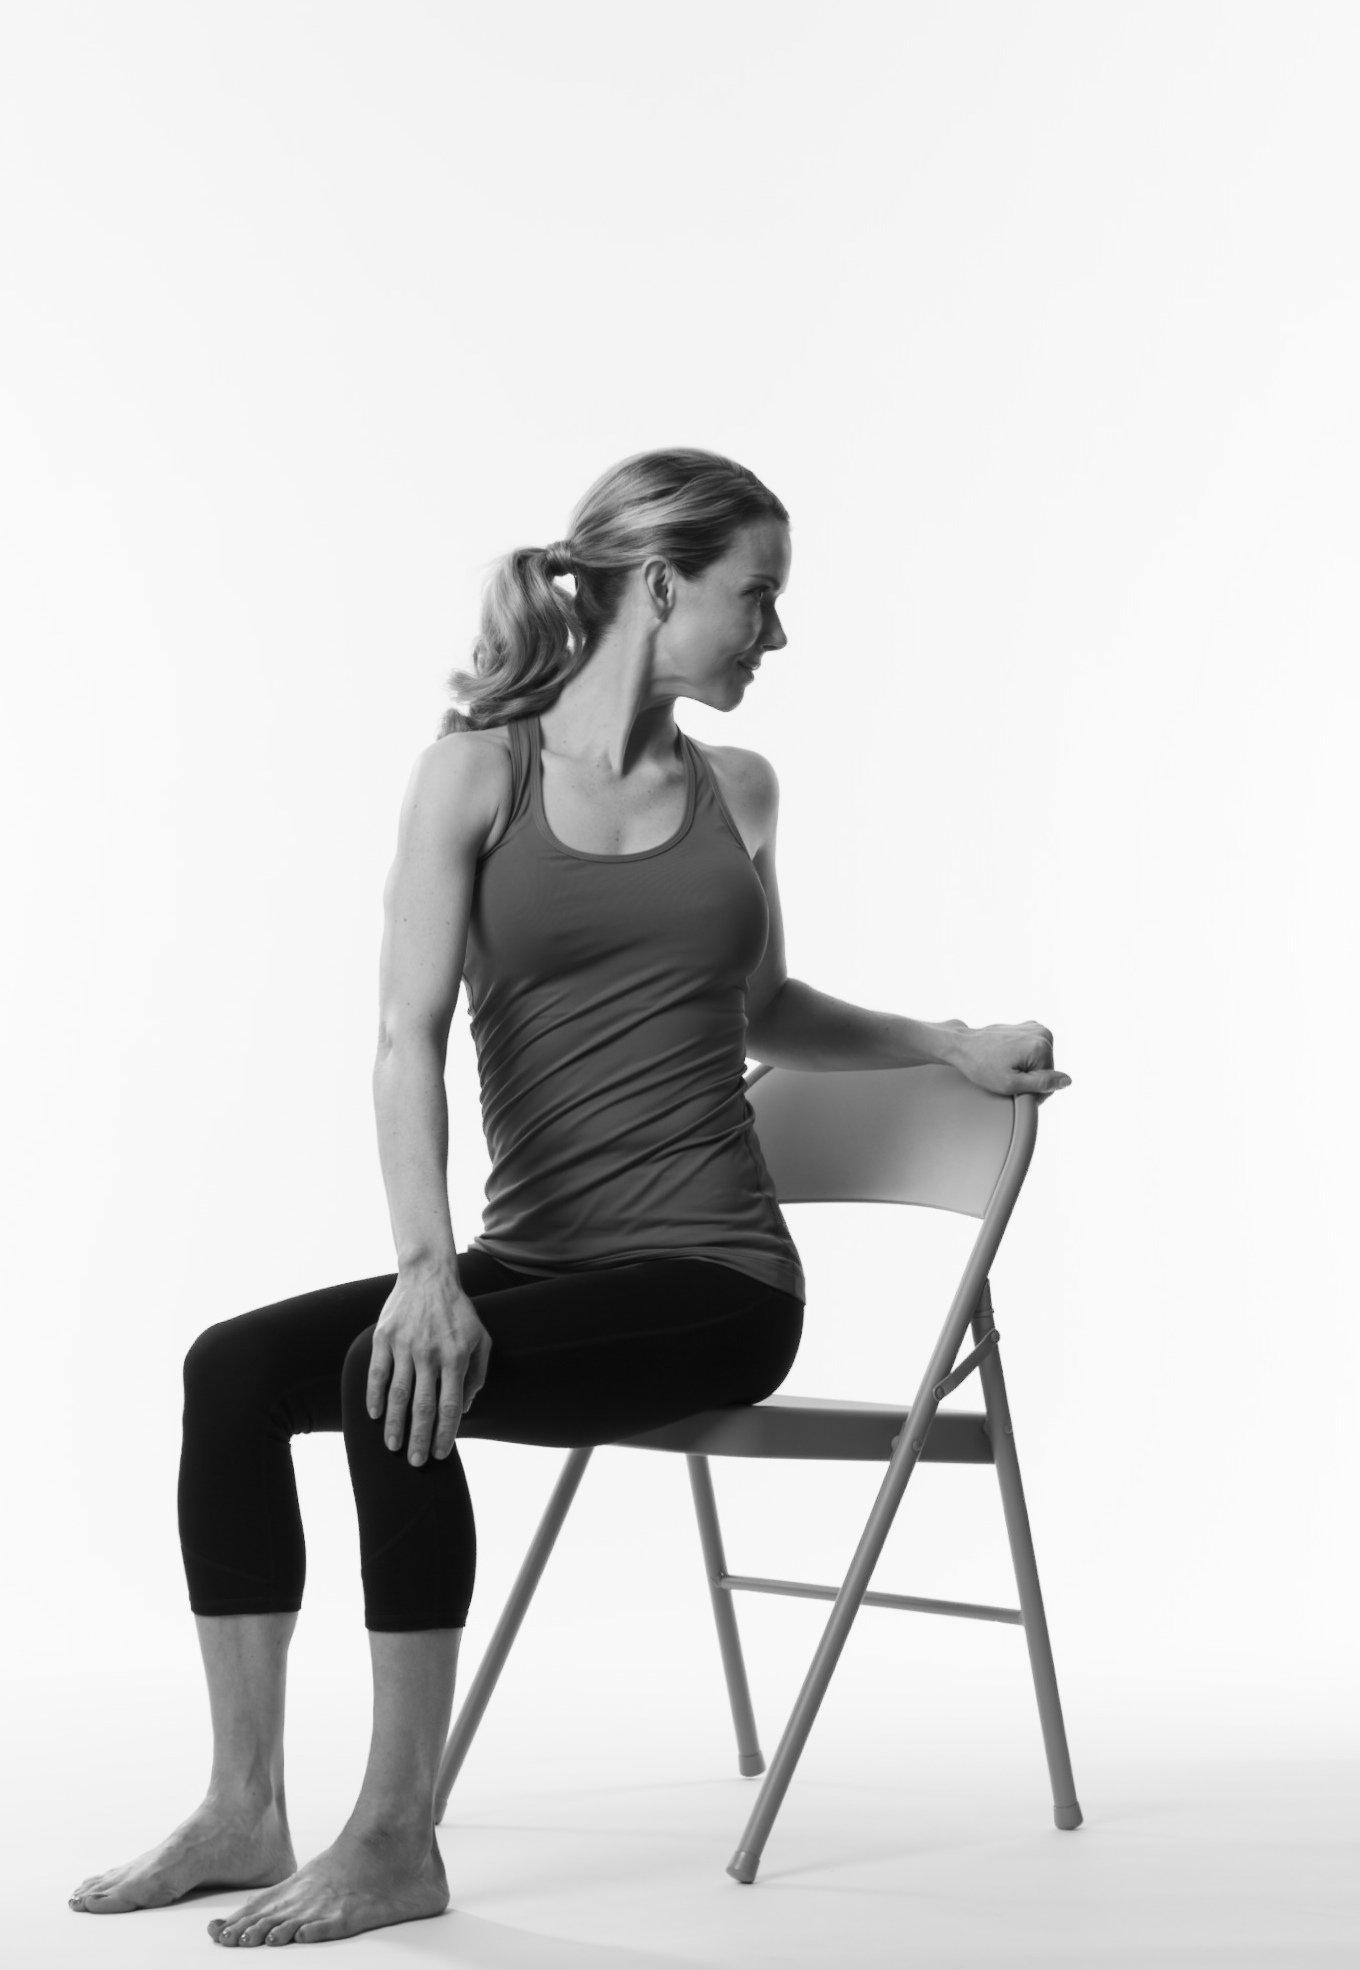 chair gym exercise book korum fishing on ebay yoga my releases today amazon kristin